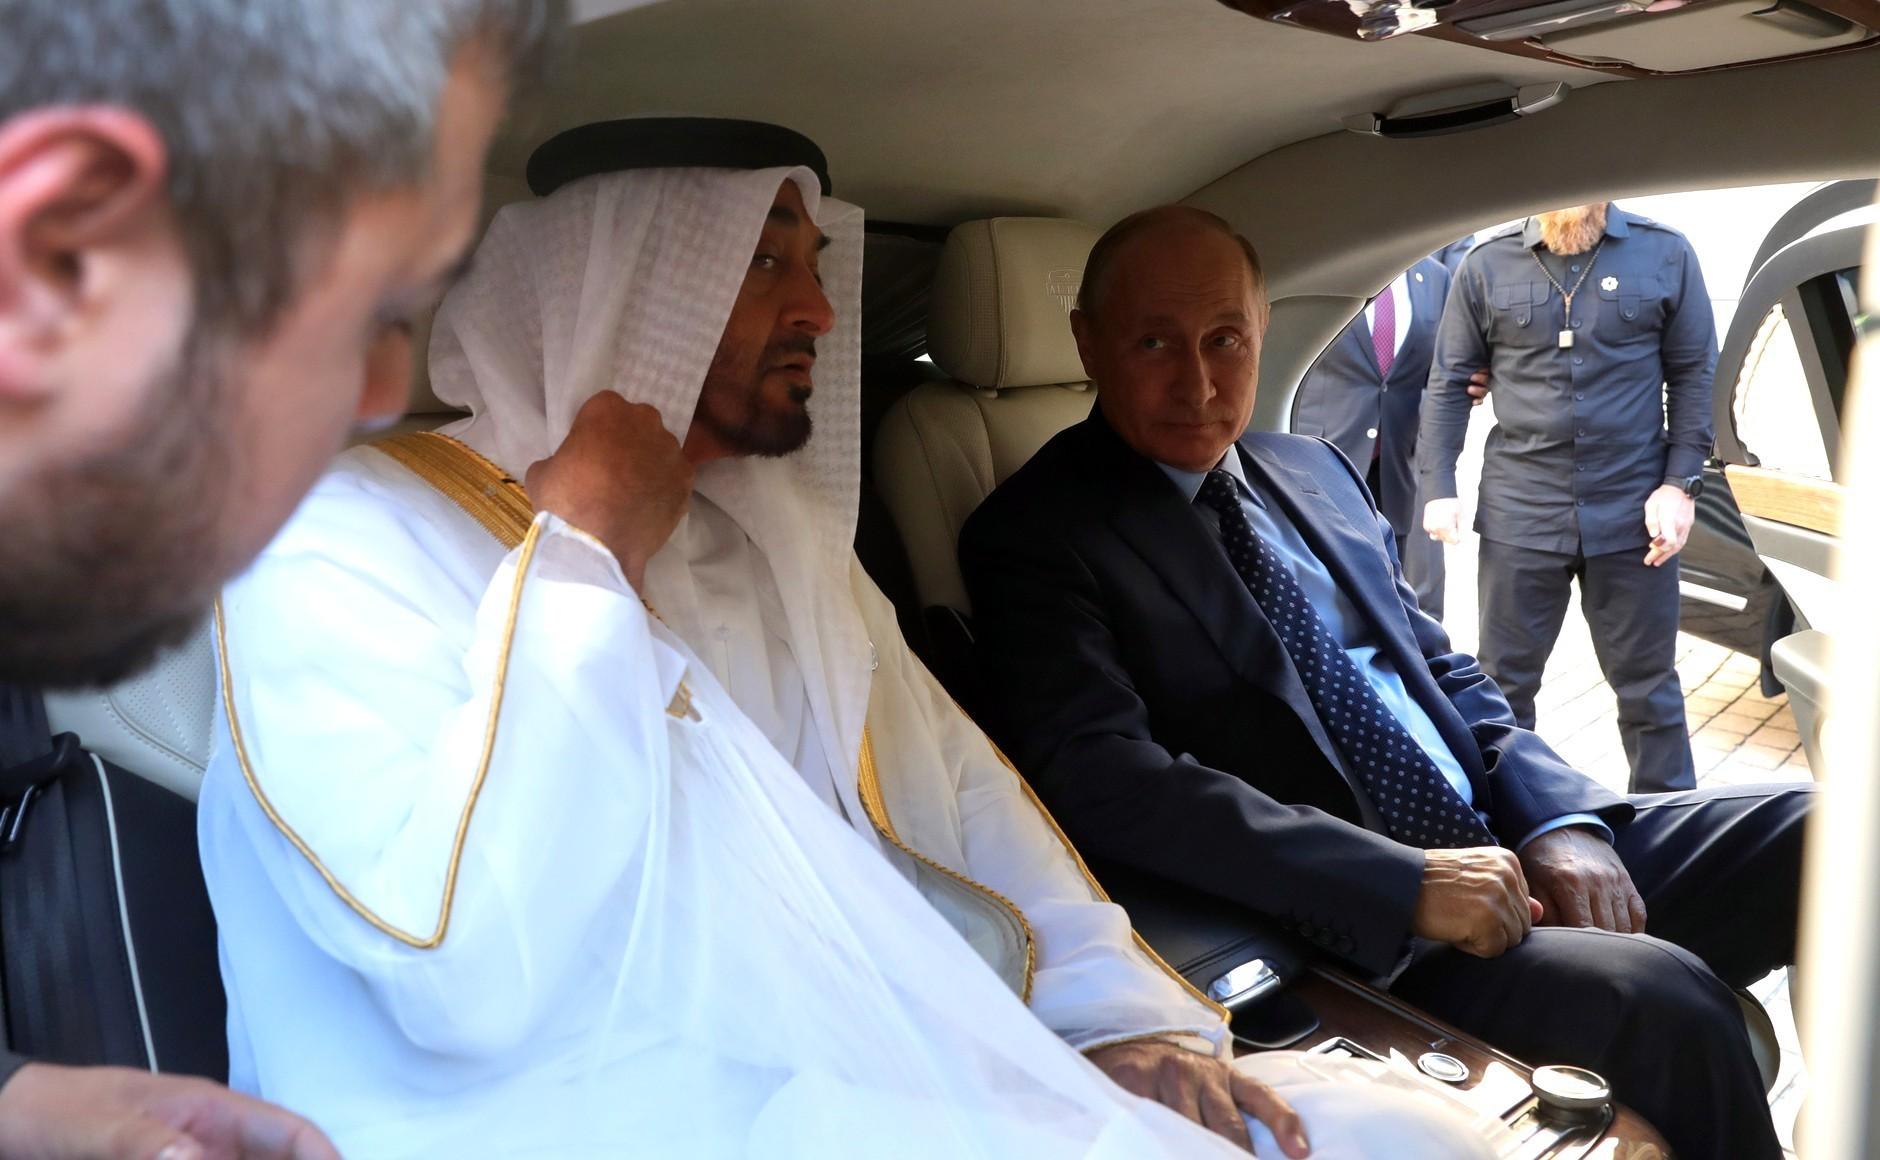 Putin i prijestolonasljednik emirata Abu Dhabija Mohammed bin Zayed Al Nahyan u limuzini Aurus, 1. lipnja 2018.